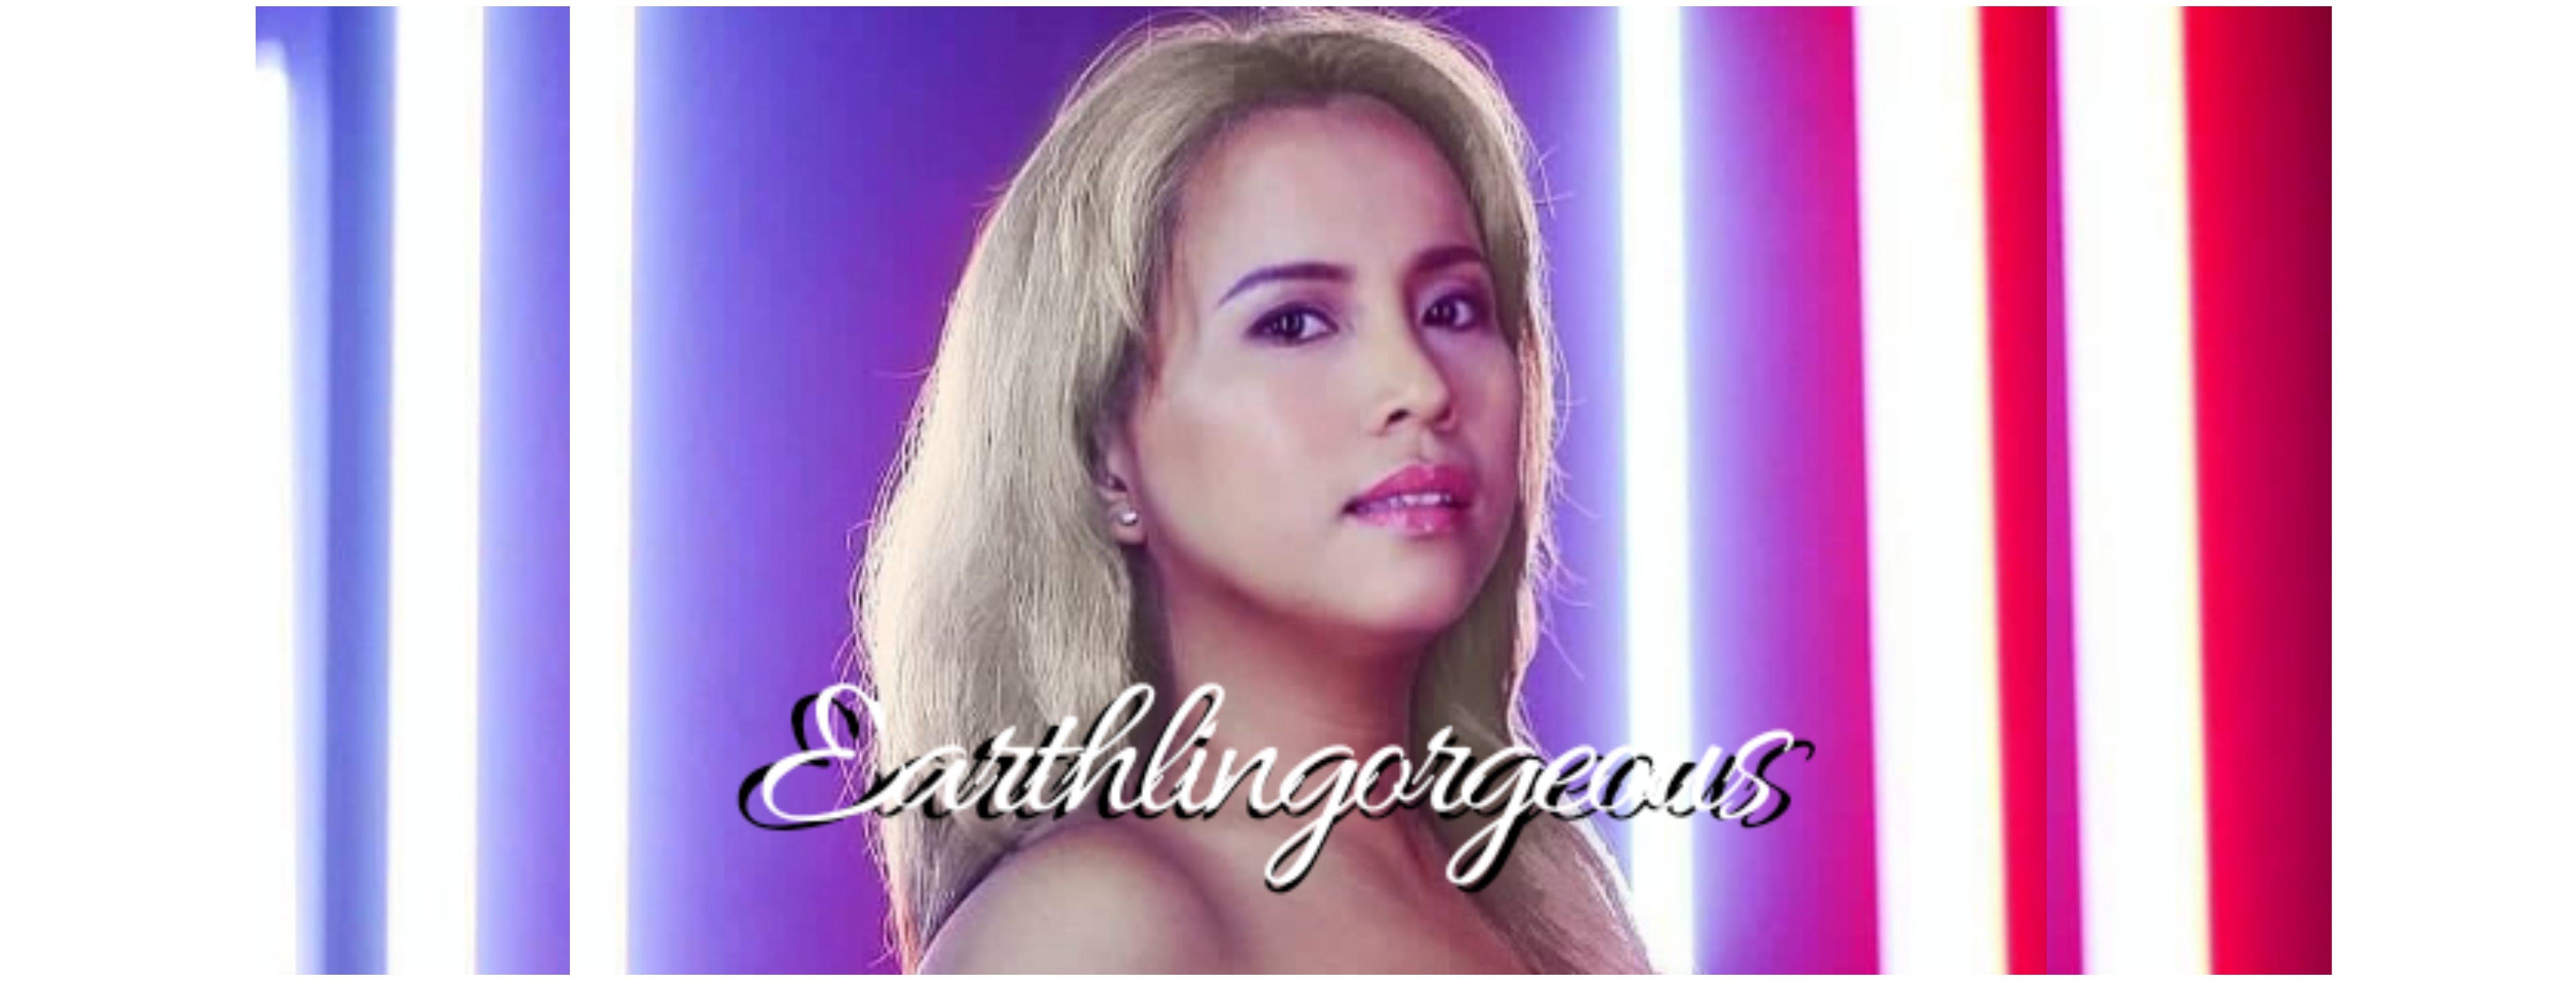 Earthlingorgeous